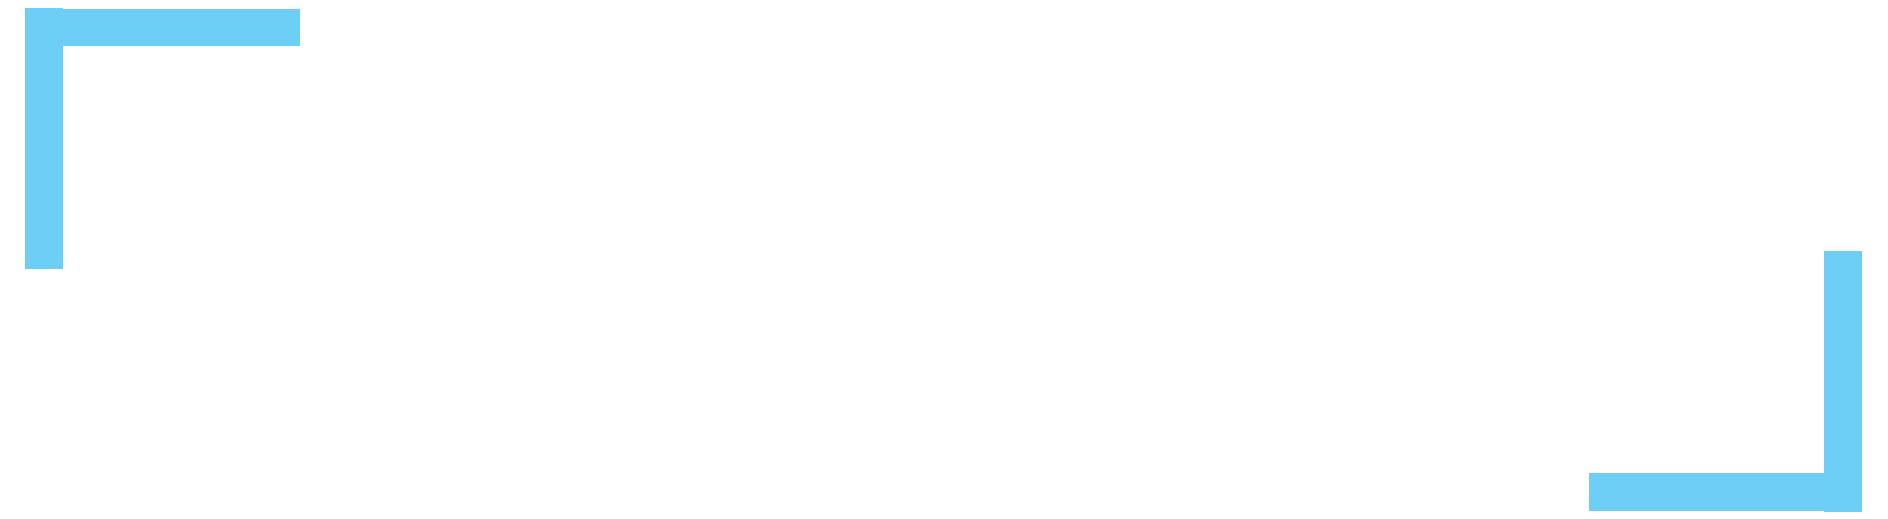 Divong.com